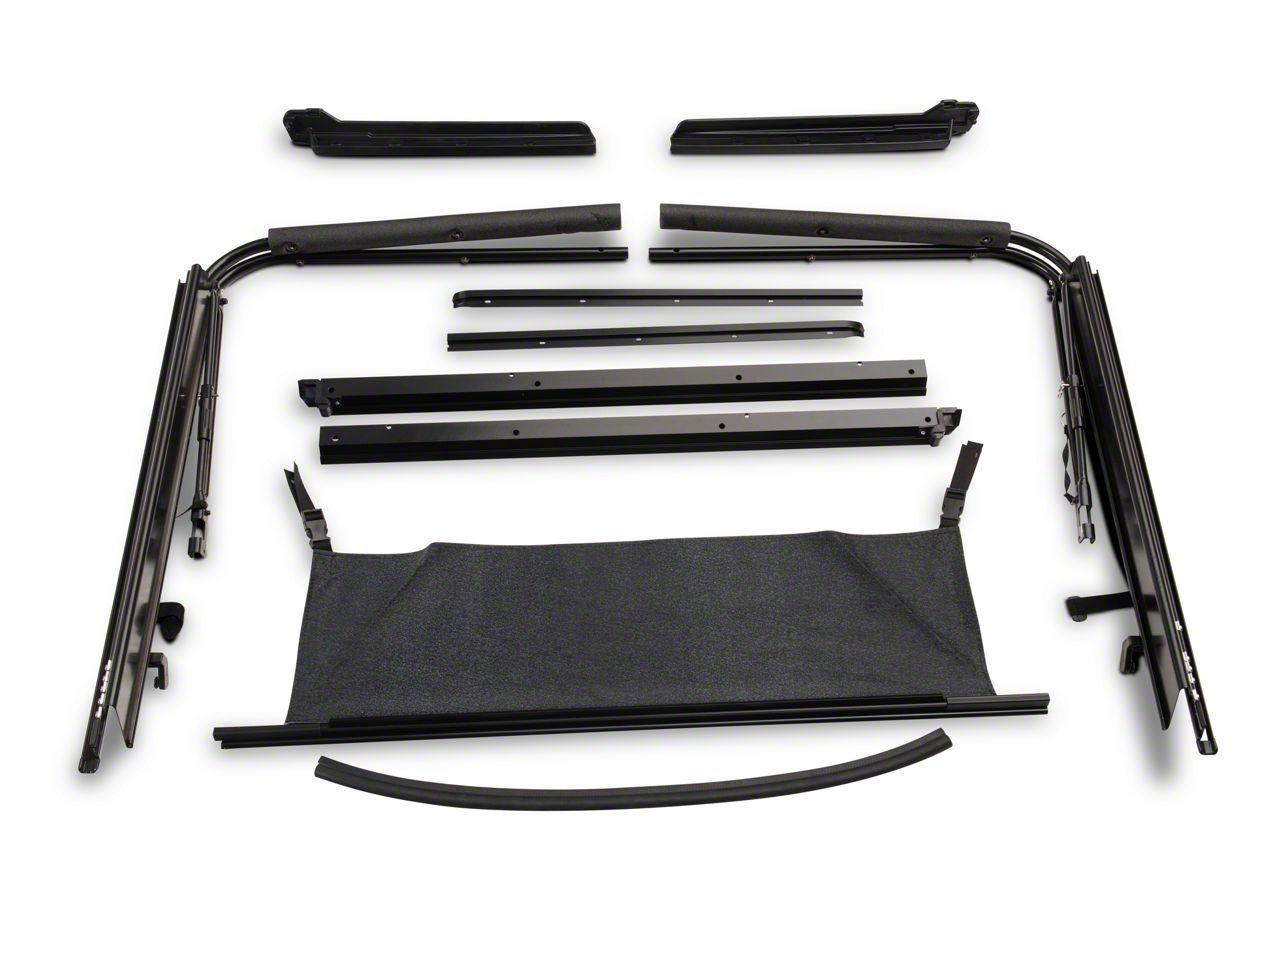 RT Off-Road Soft Top Hardware Kit (87-95 Jeep Wrangler YJ)